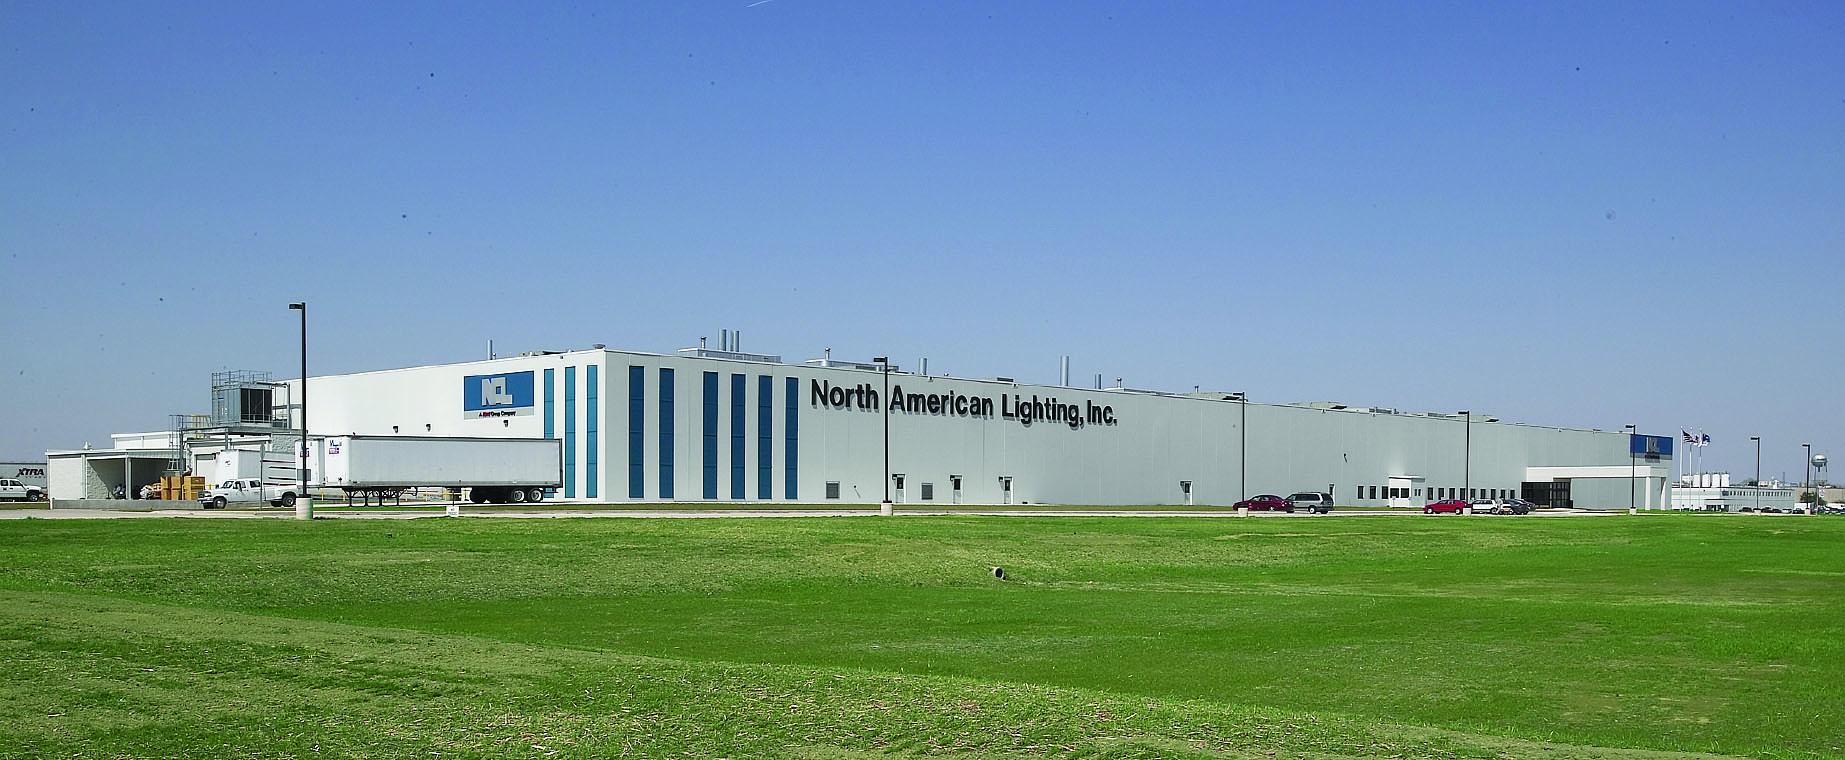 North American Lighting & North American Lighting - Agracel Inc.